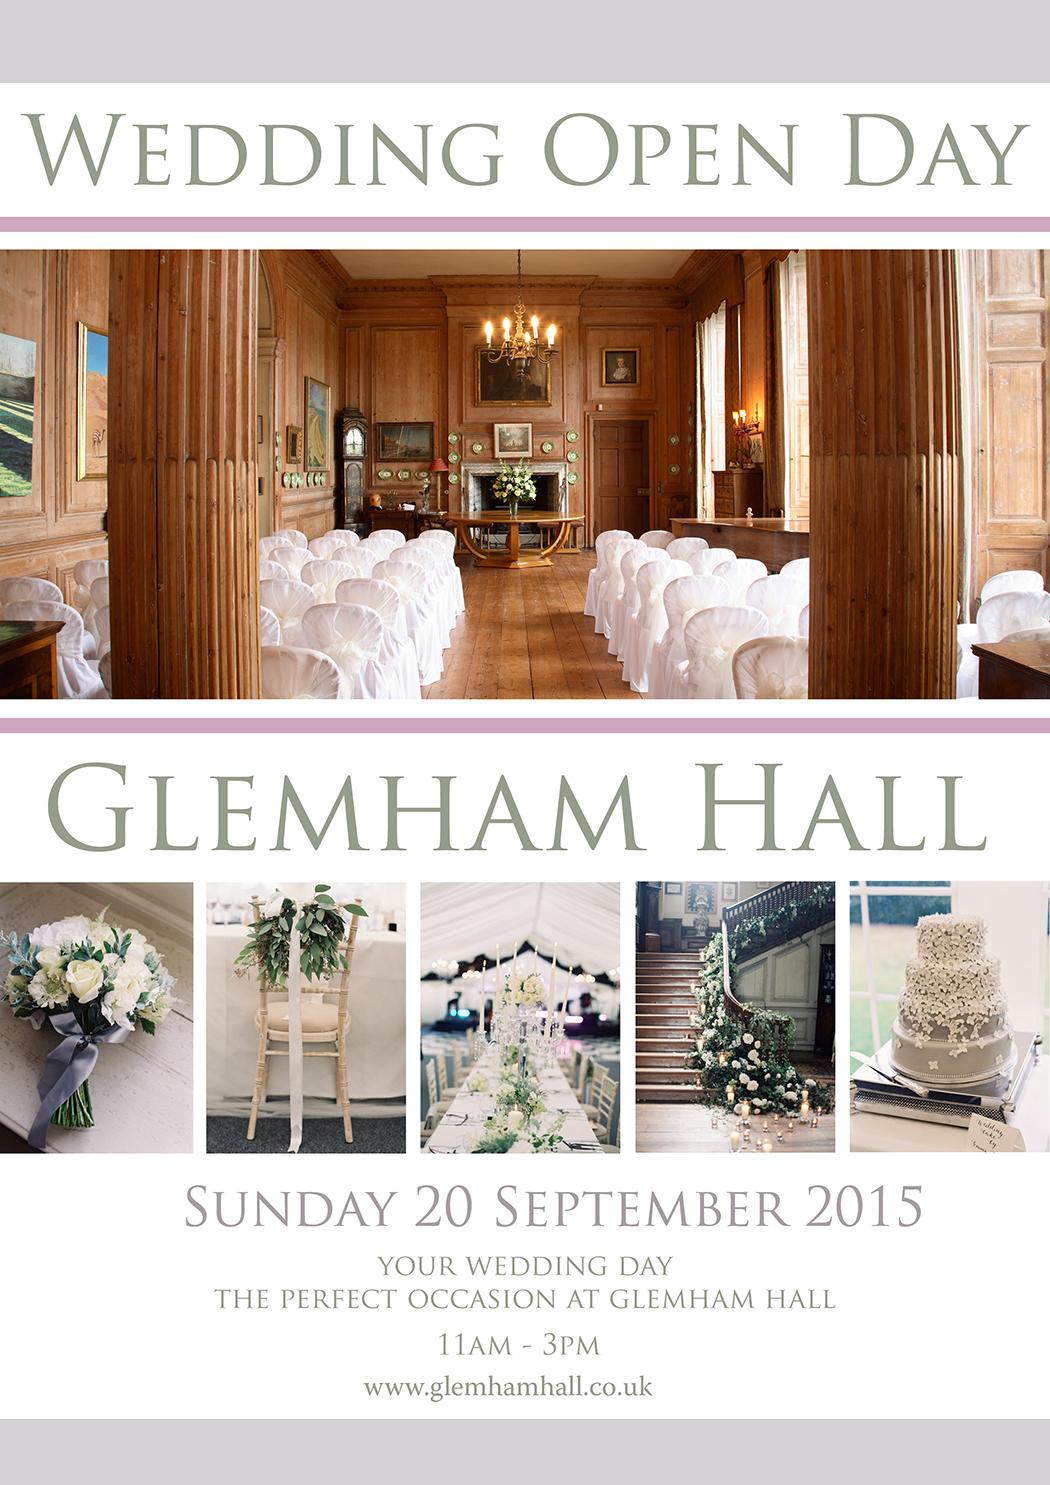 glemham-hall-wedding-open-day